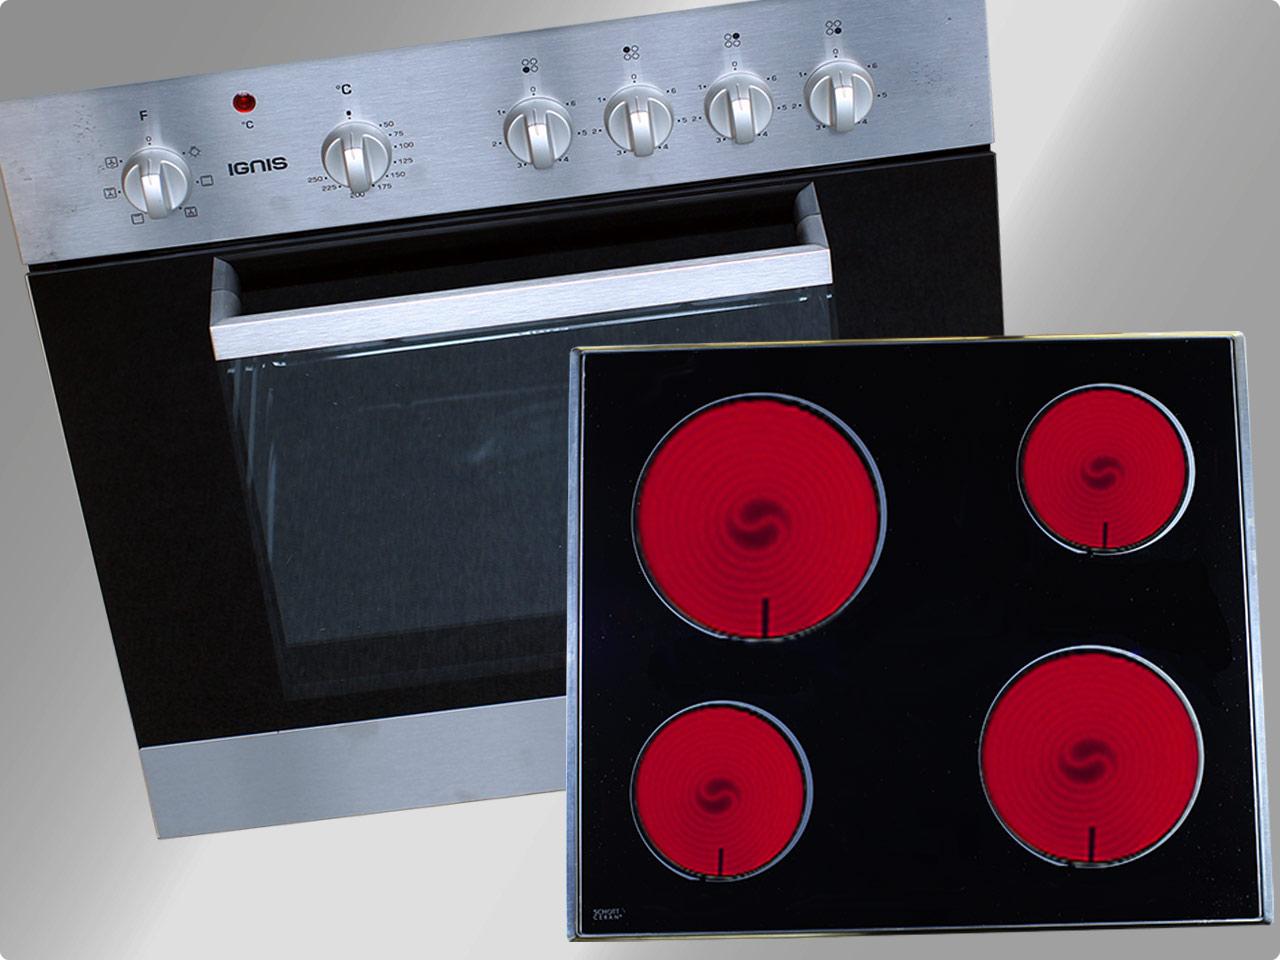 aks 2010 ix einbau herdset ober unterhitze umluft grill ceranfeld schott 2 wahl ebay. Black Bedroom Furniture Sets. Home Design Ideas